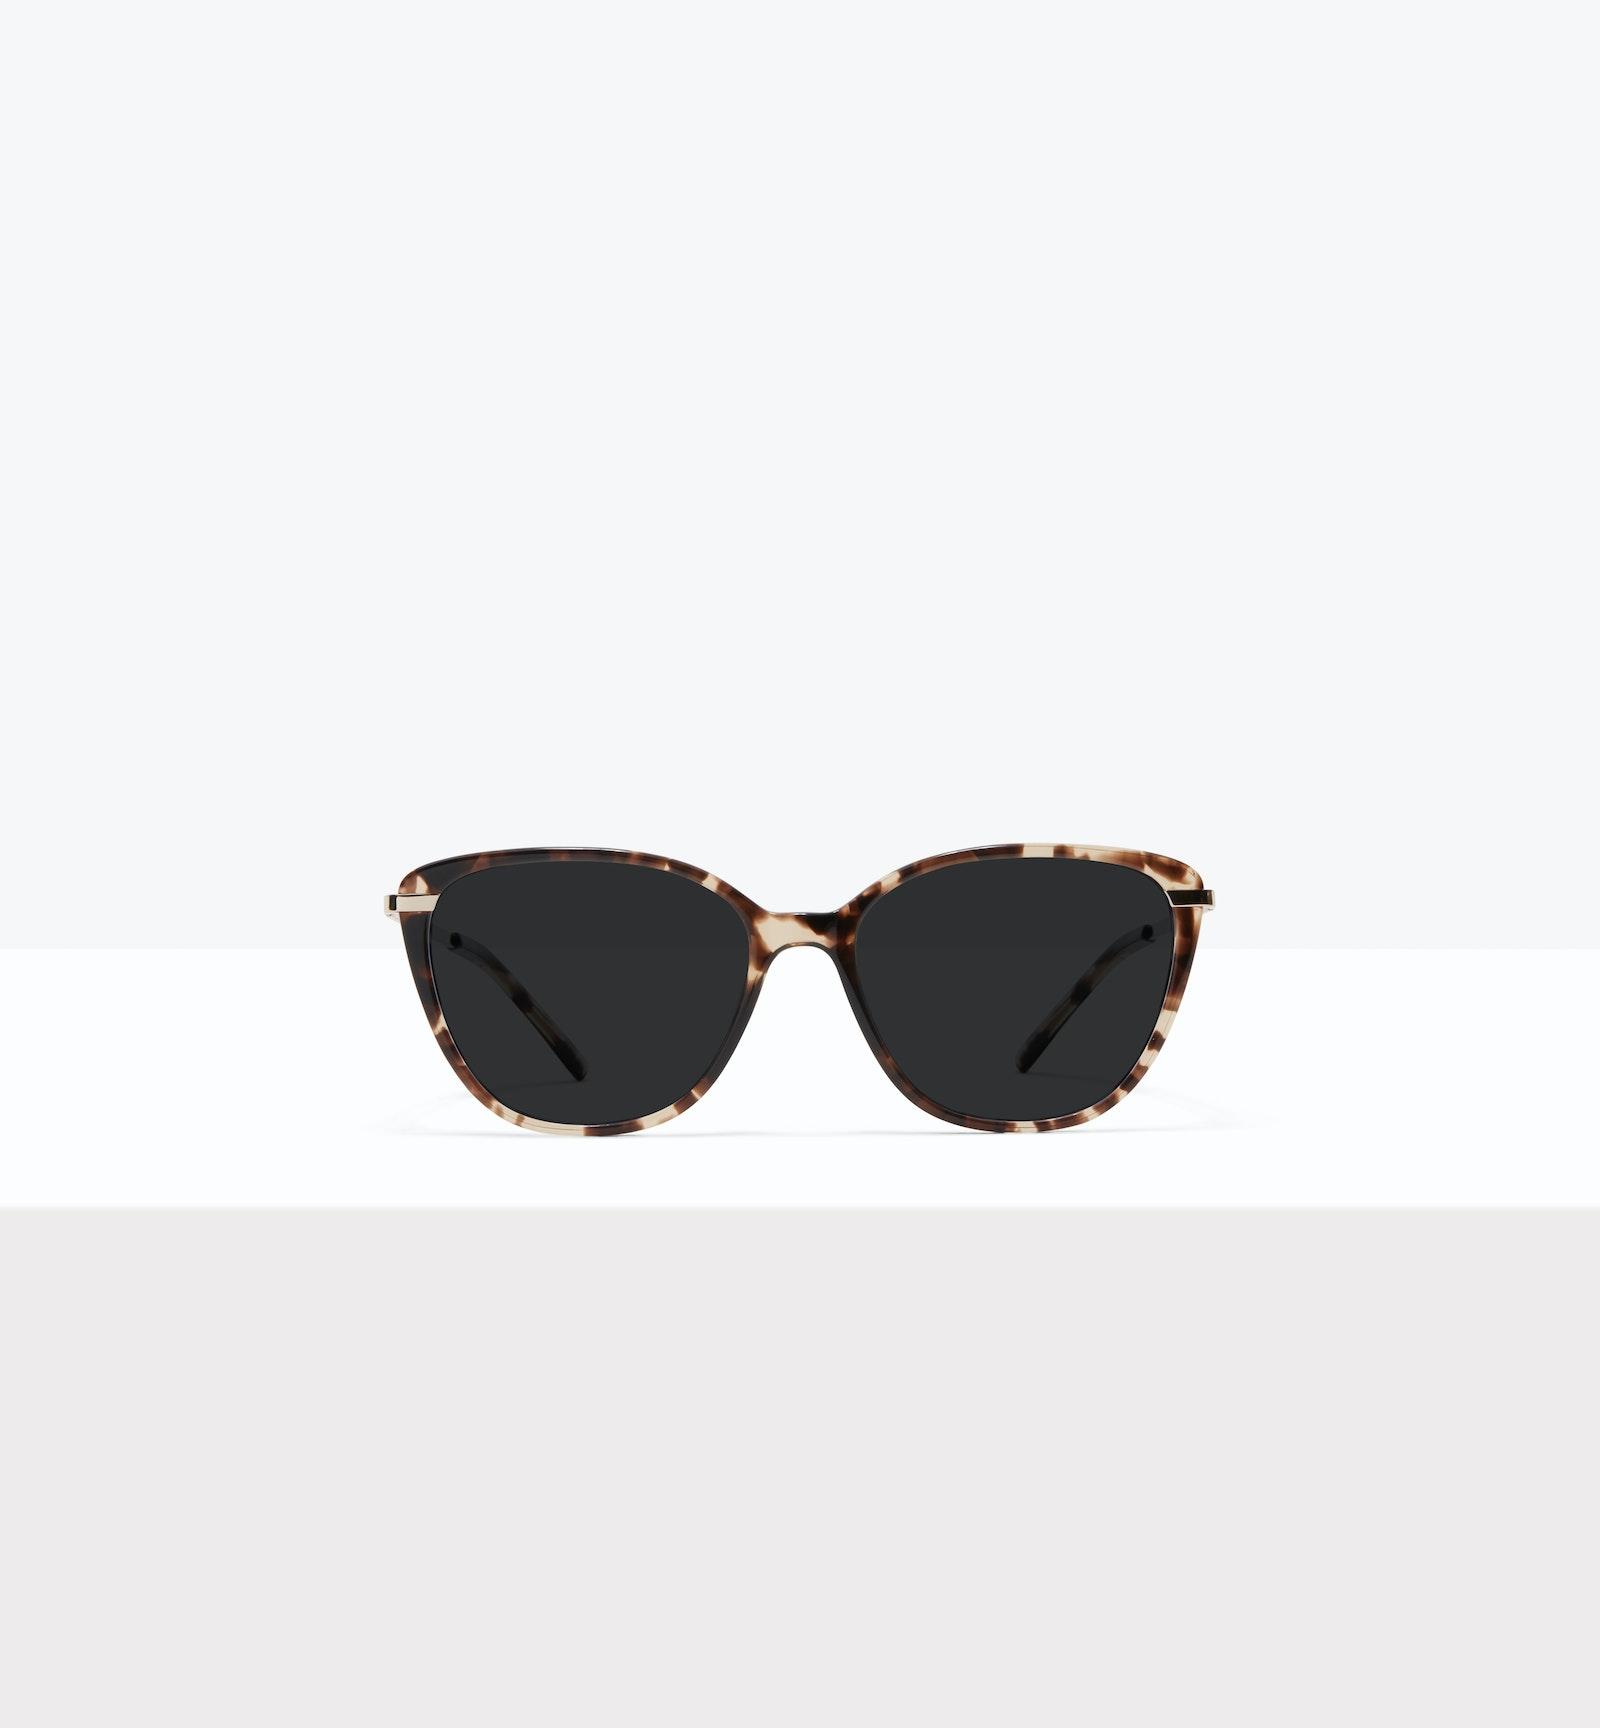 Affordable Fashion Glasses Rectangle Square Sunglasses Women Illusion L Leopard